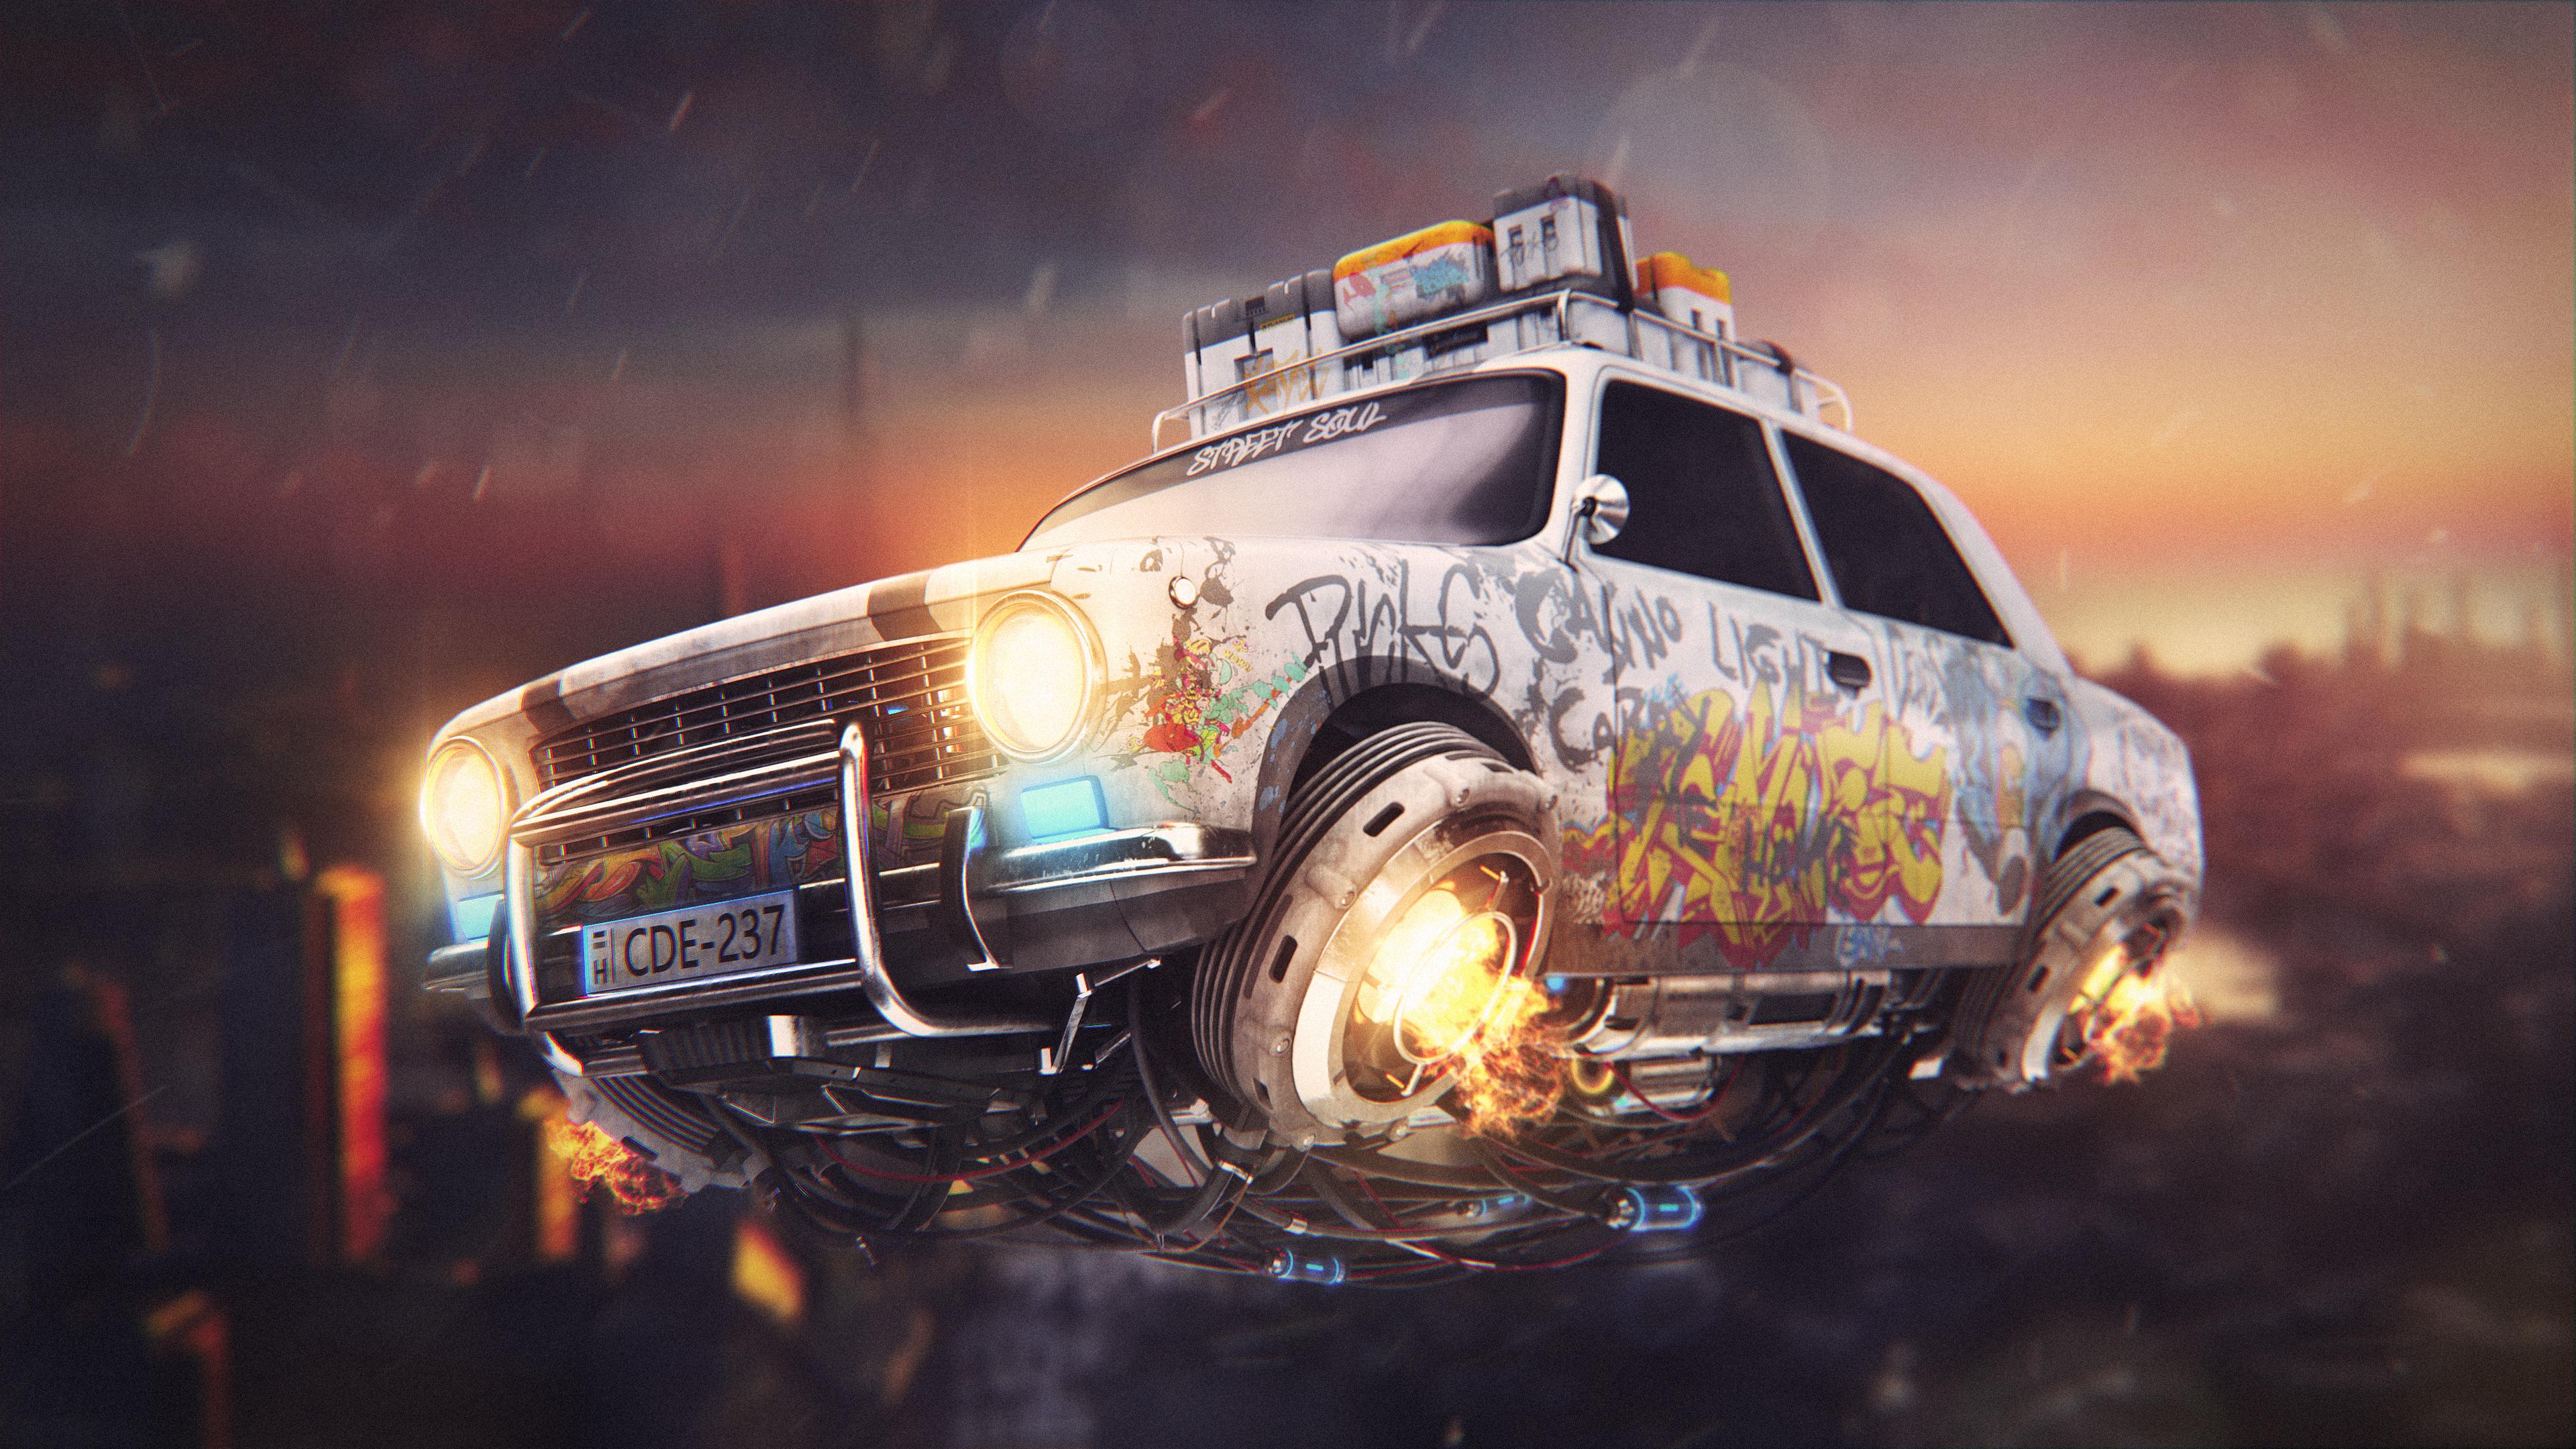 graffiti cyberpunk car 4k 1560534249 - Graffiti Cyberpunk Car 4k - hd-wallpapers, graffiti wallpapers, digital art wallpapers, cars wallpapers, behance wallpapers, artwork wallpapers, artist wallpapers, 4k-wallpapers